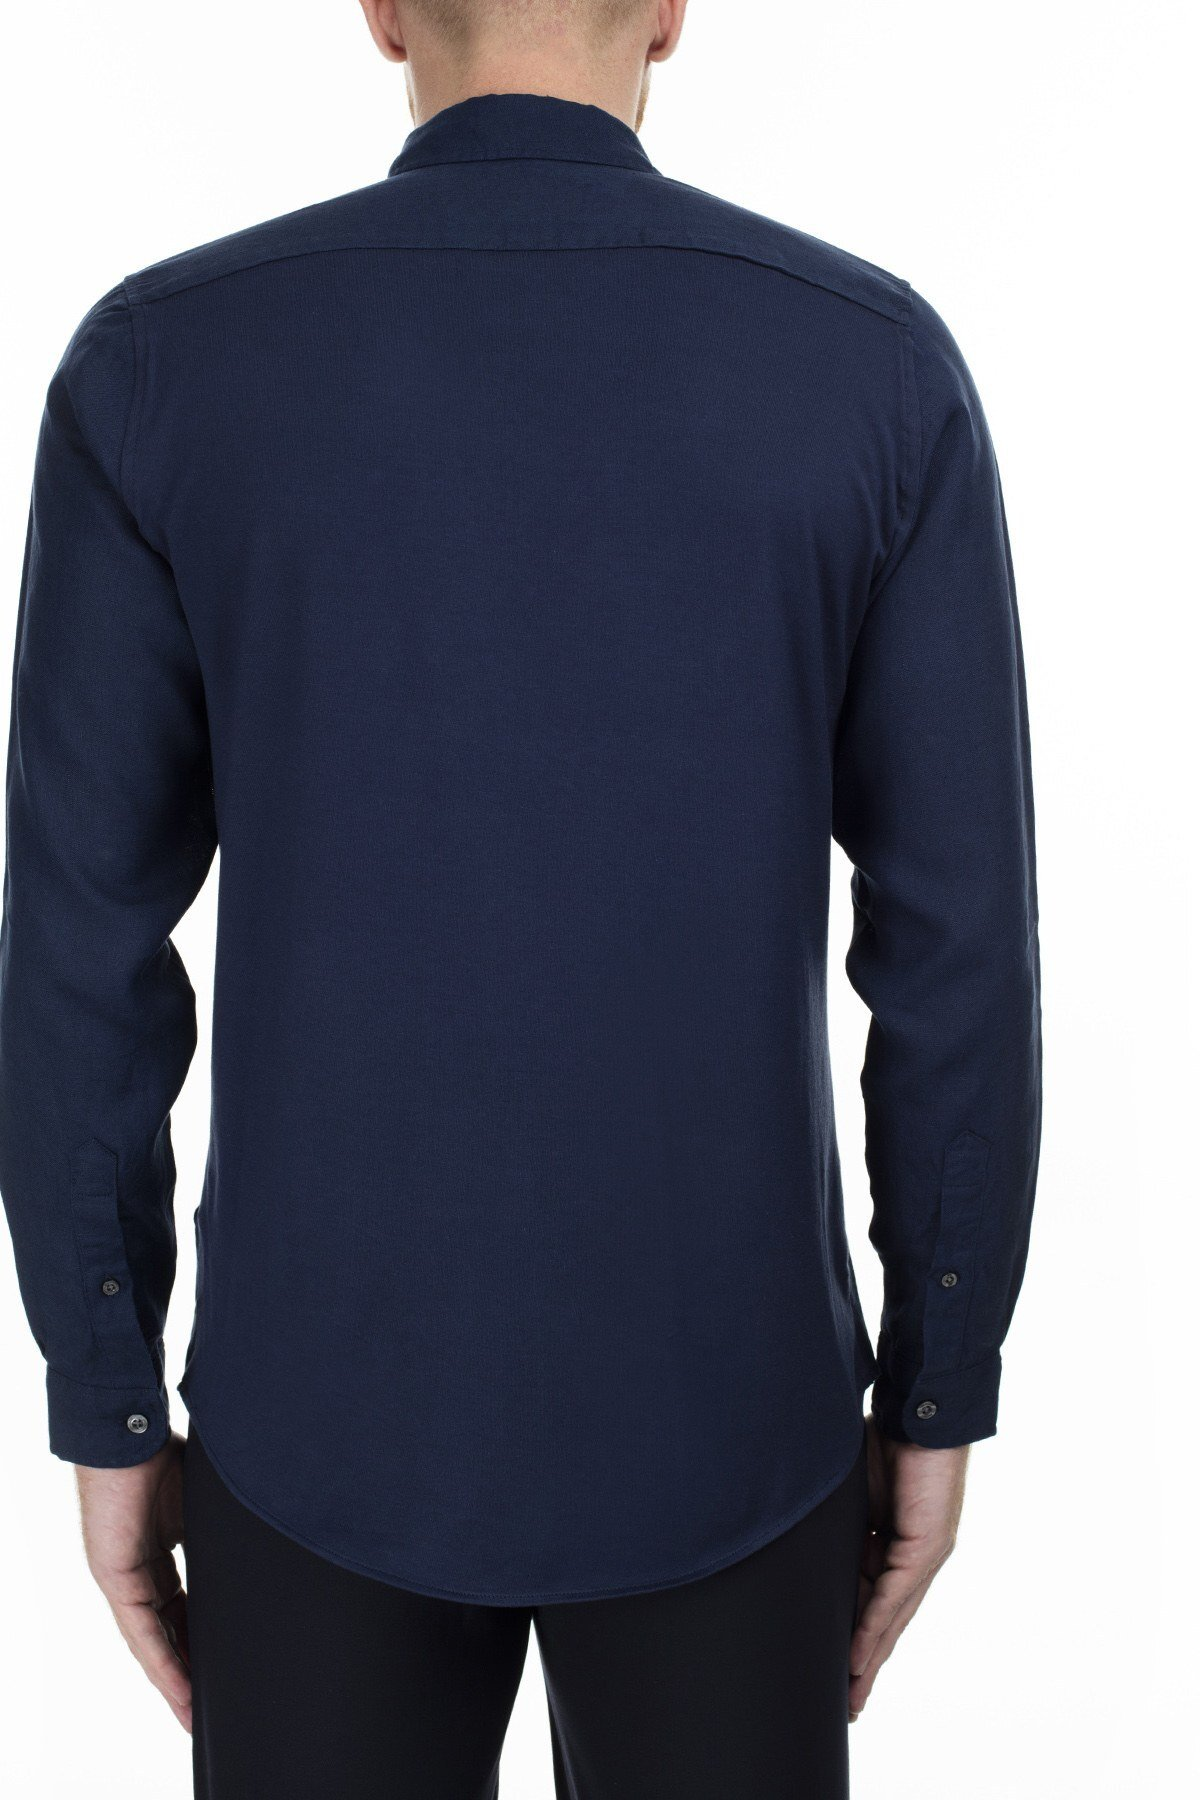 Lacoste Erkek Gömlek S CH0826L 26L LACİVERT